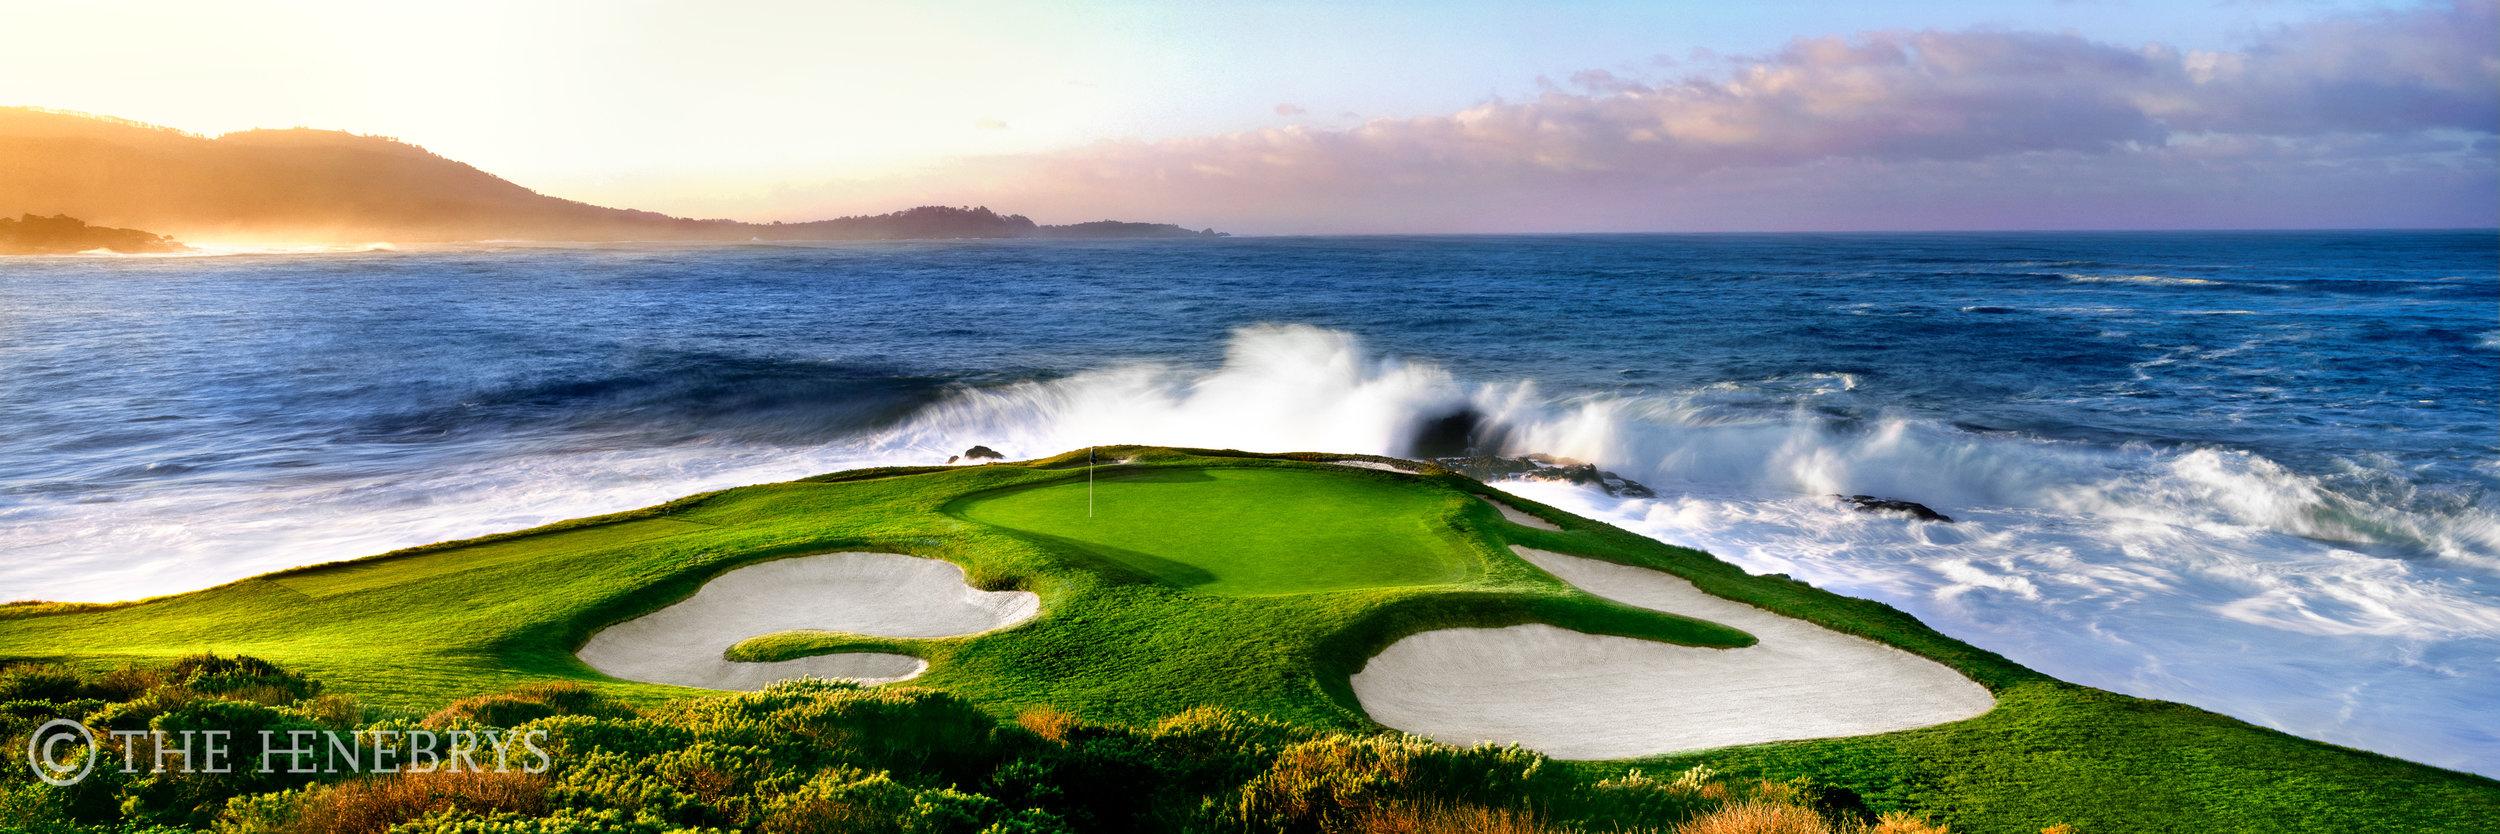 "Pebble Beach Golf Links® #07 ""King Tide"", Pebble Beach, California"